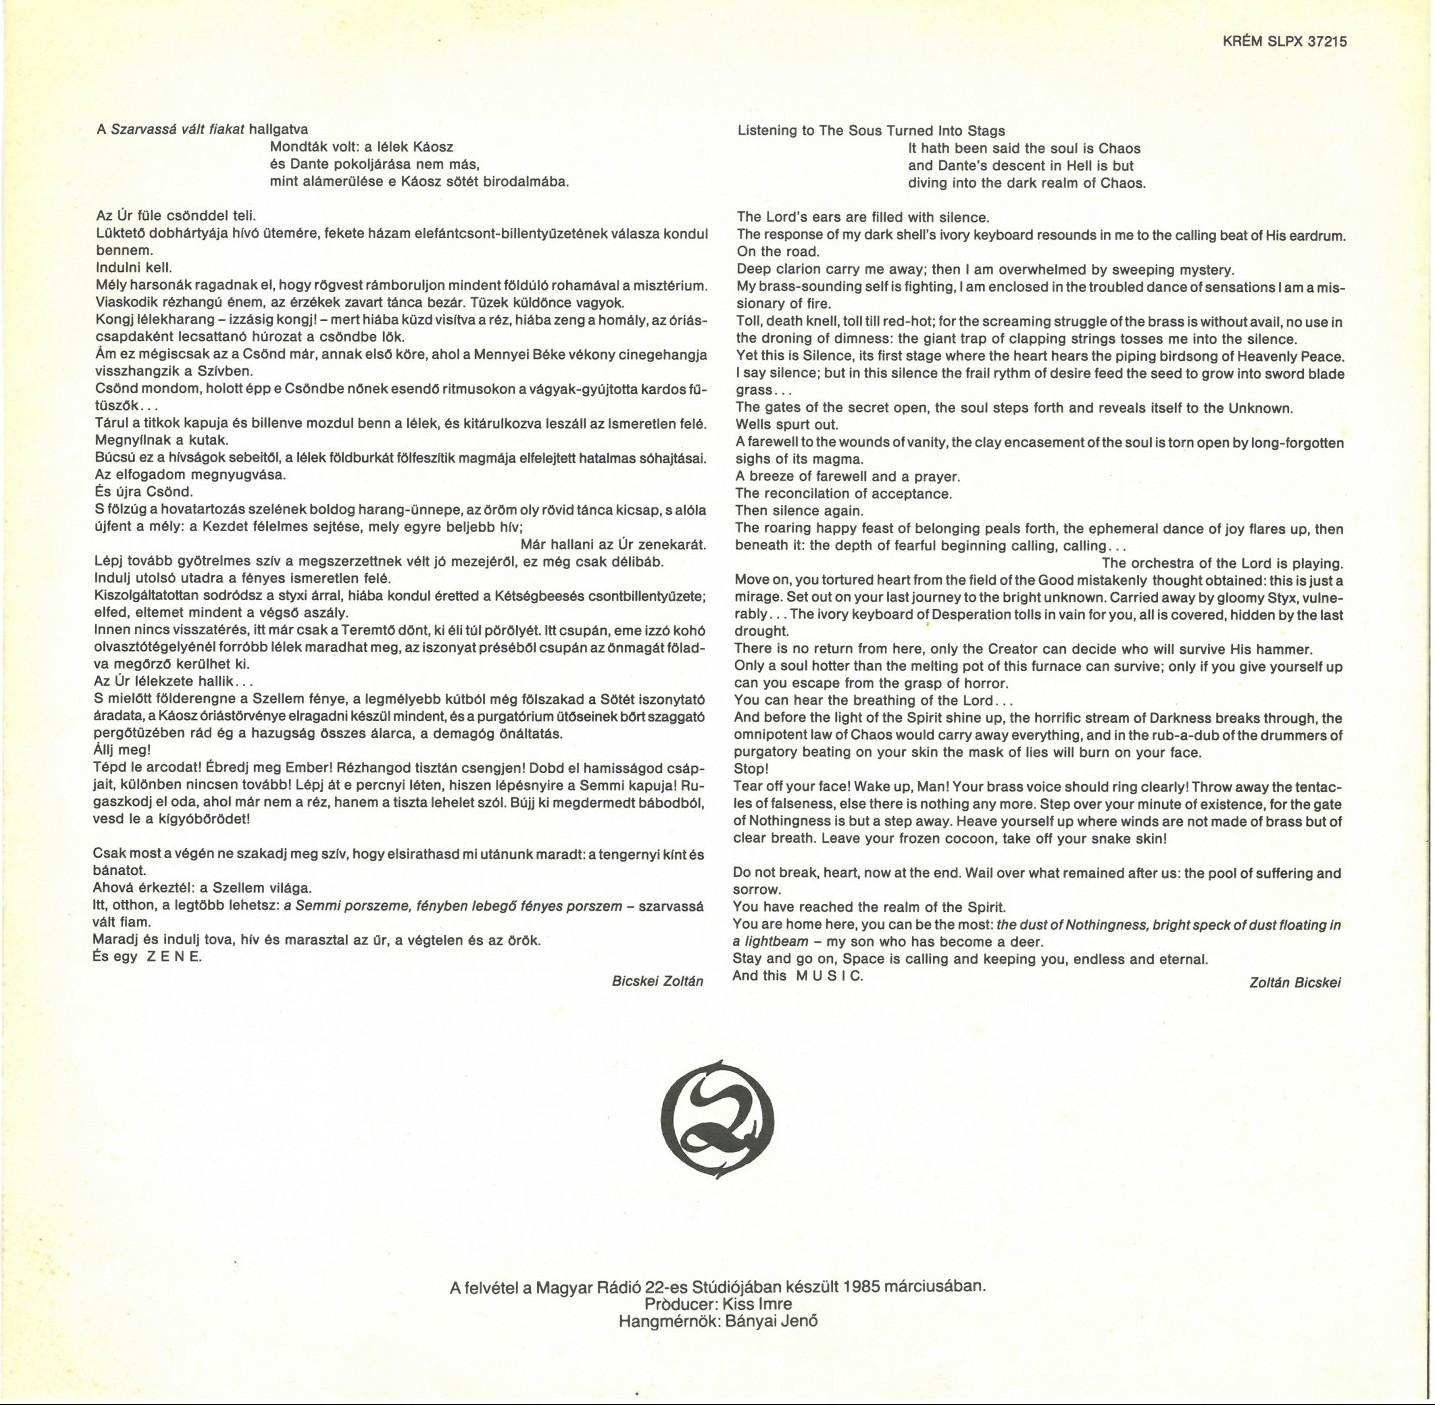 GSP1985LPI2